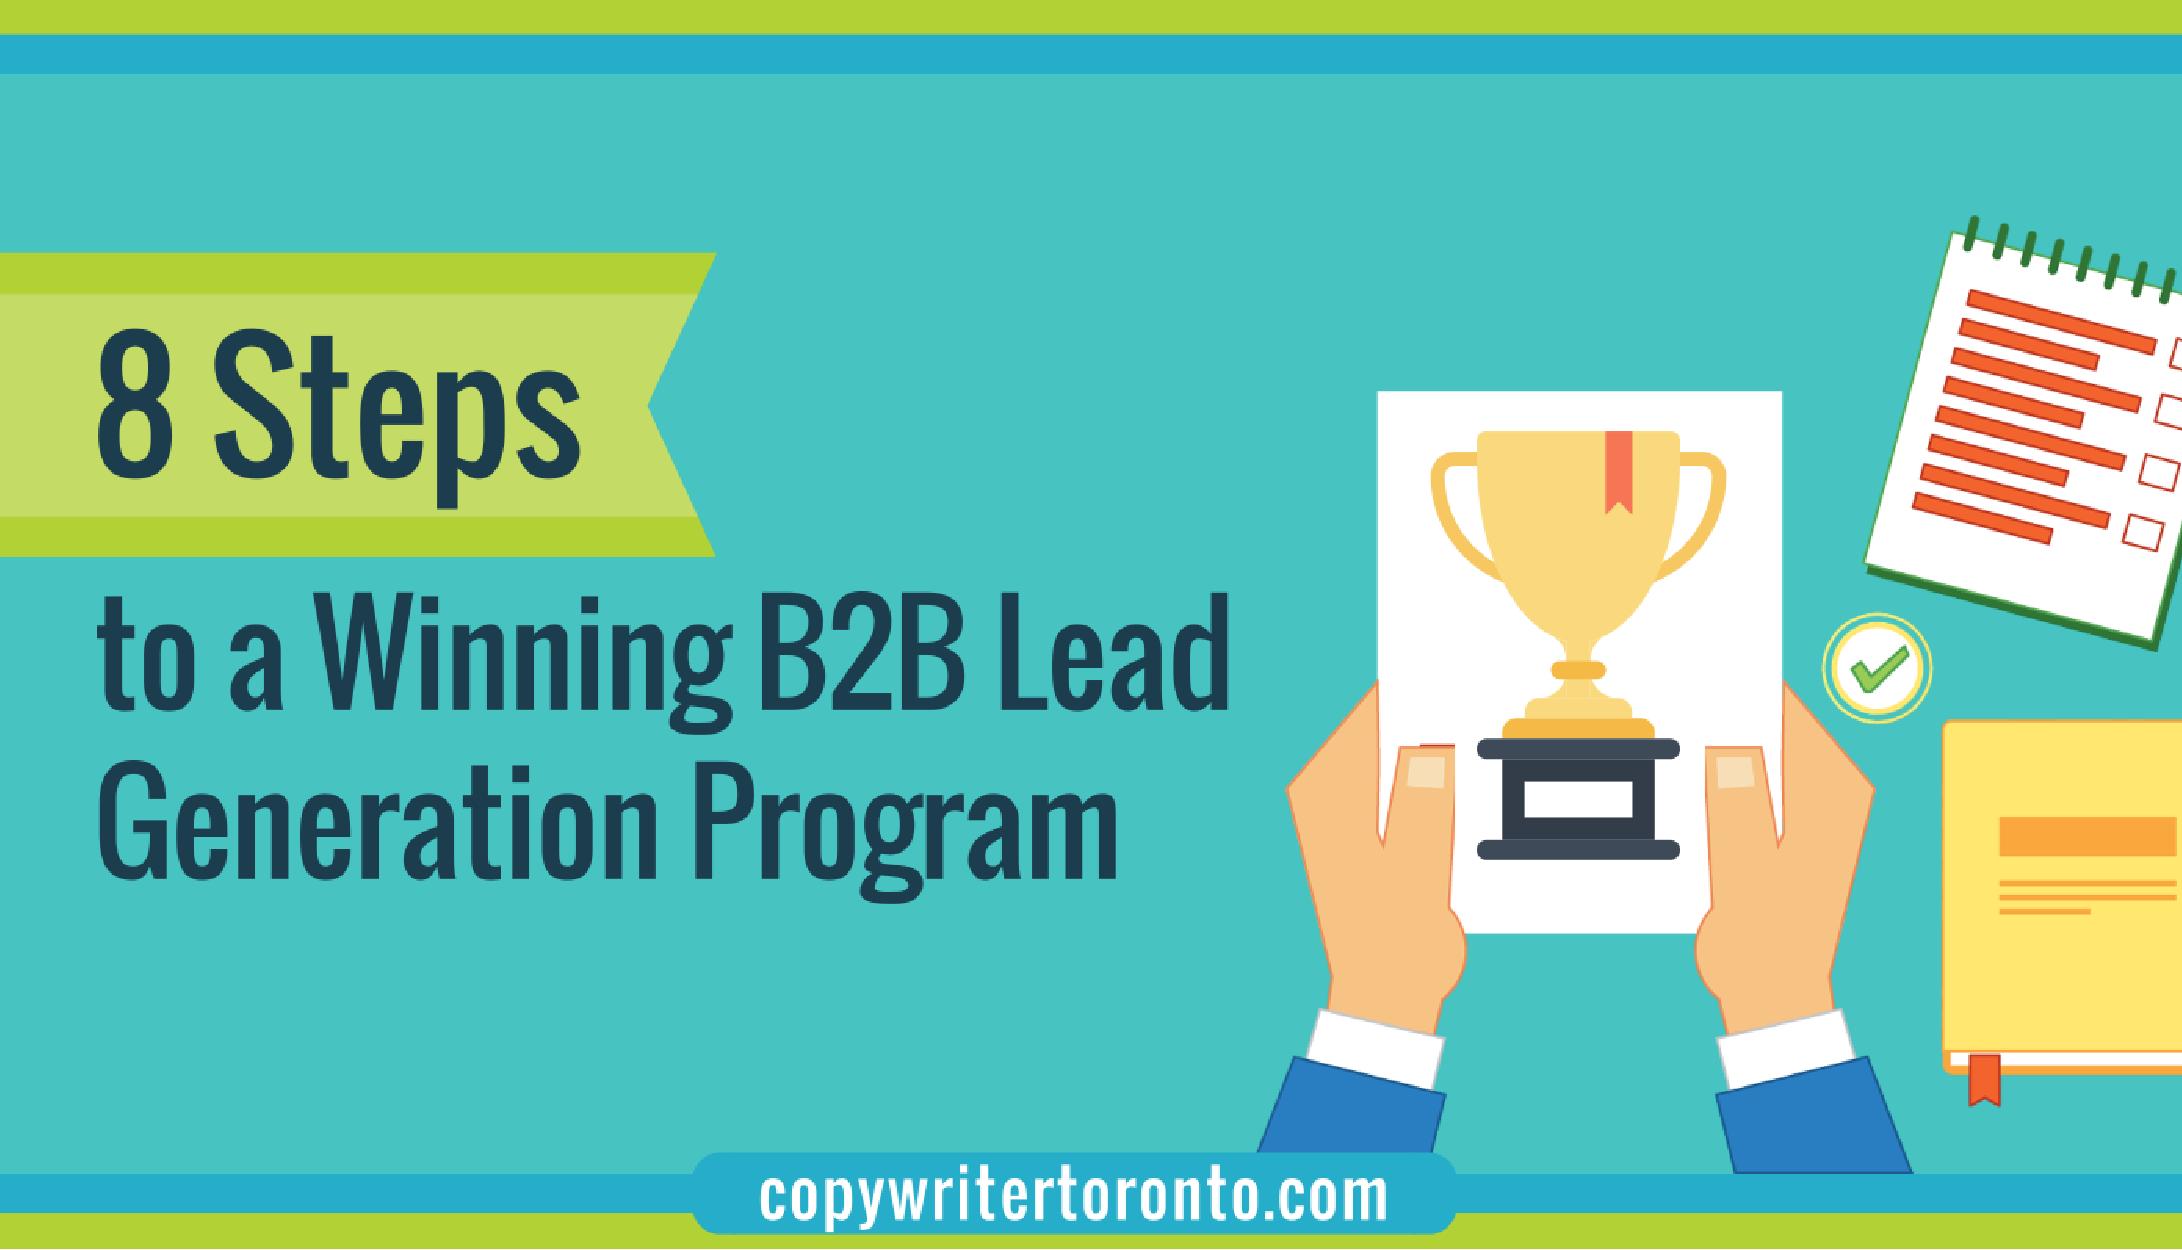 copywritertoronto-com_winning_lead_generation_strategy